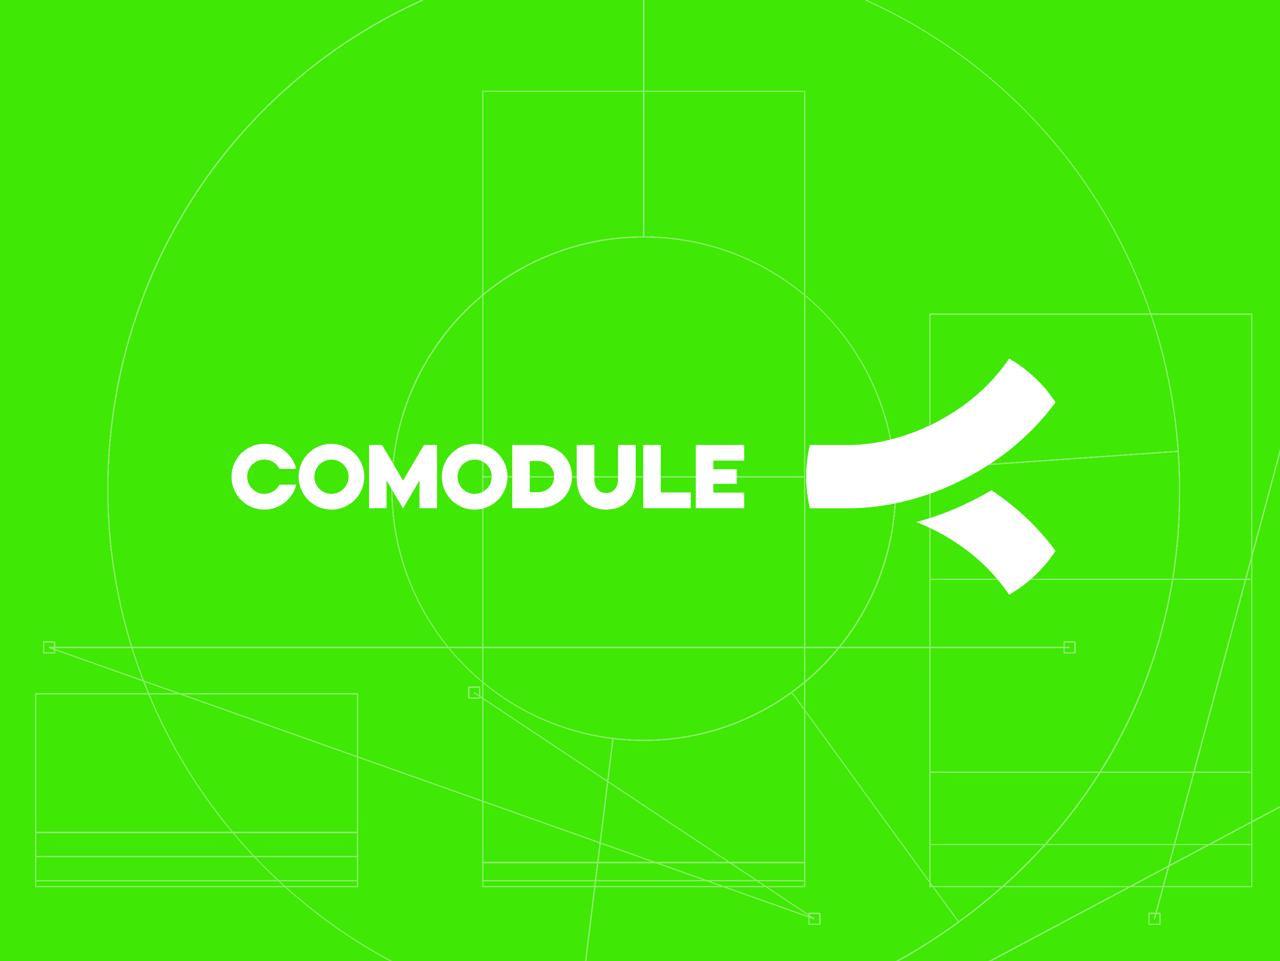 Comodule